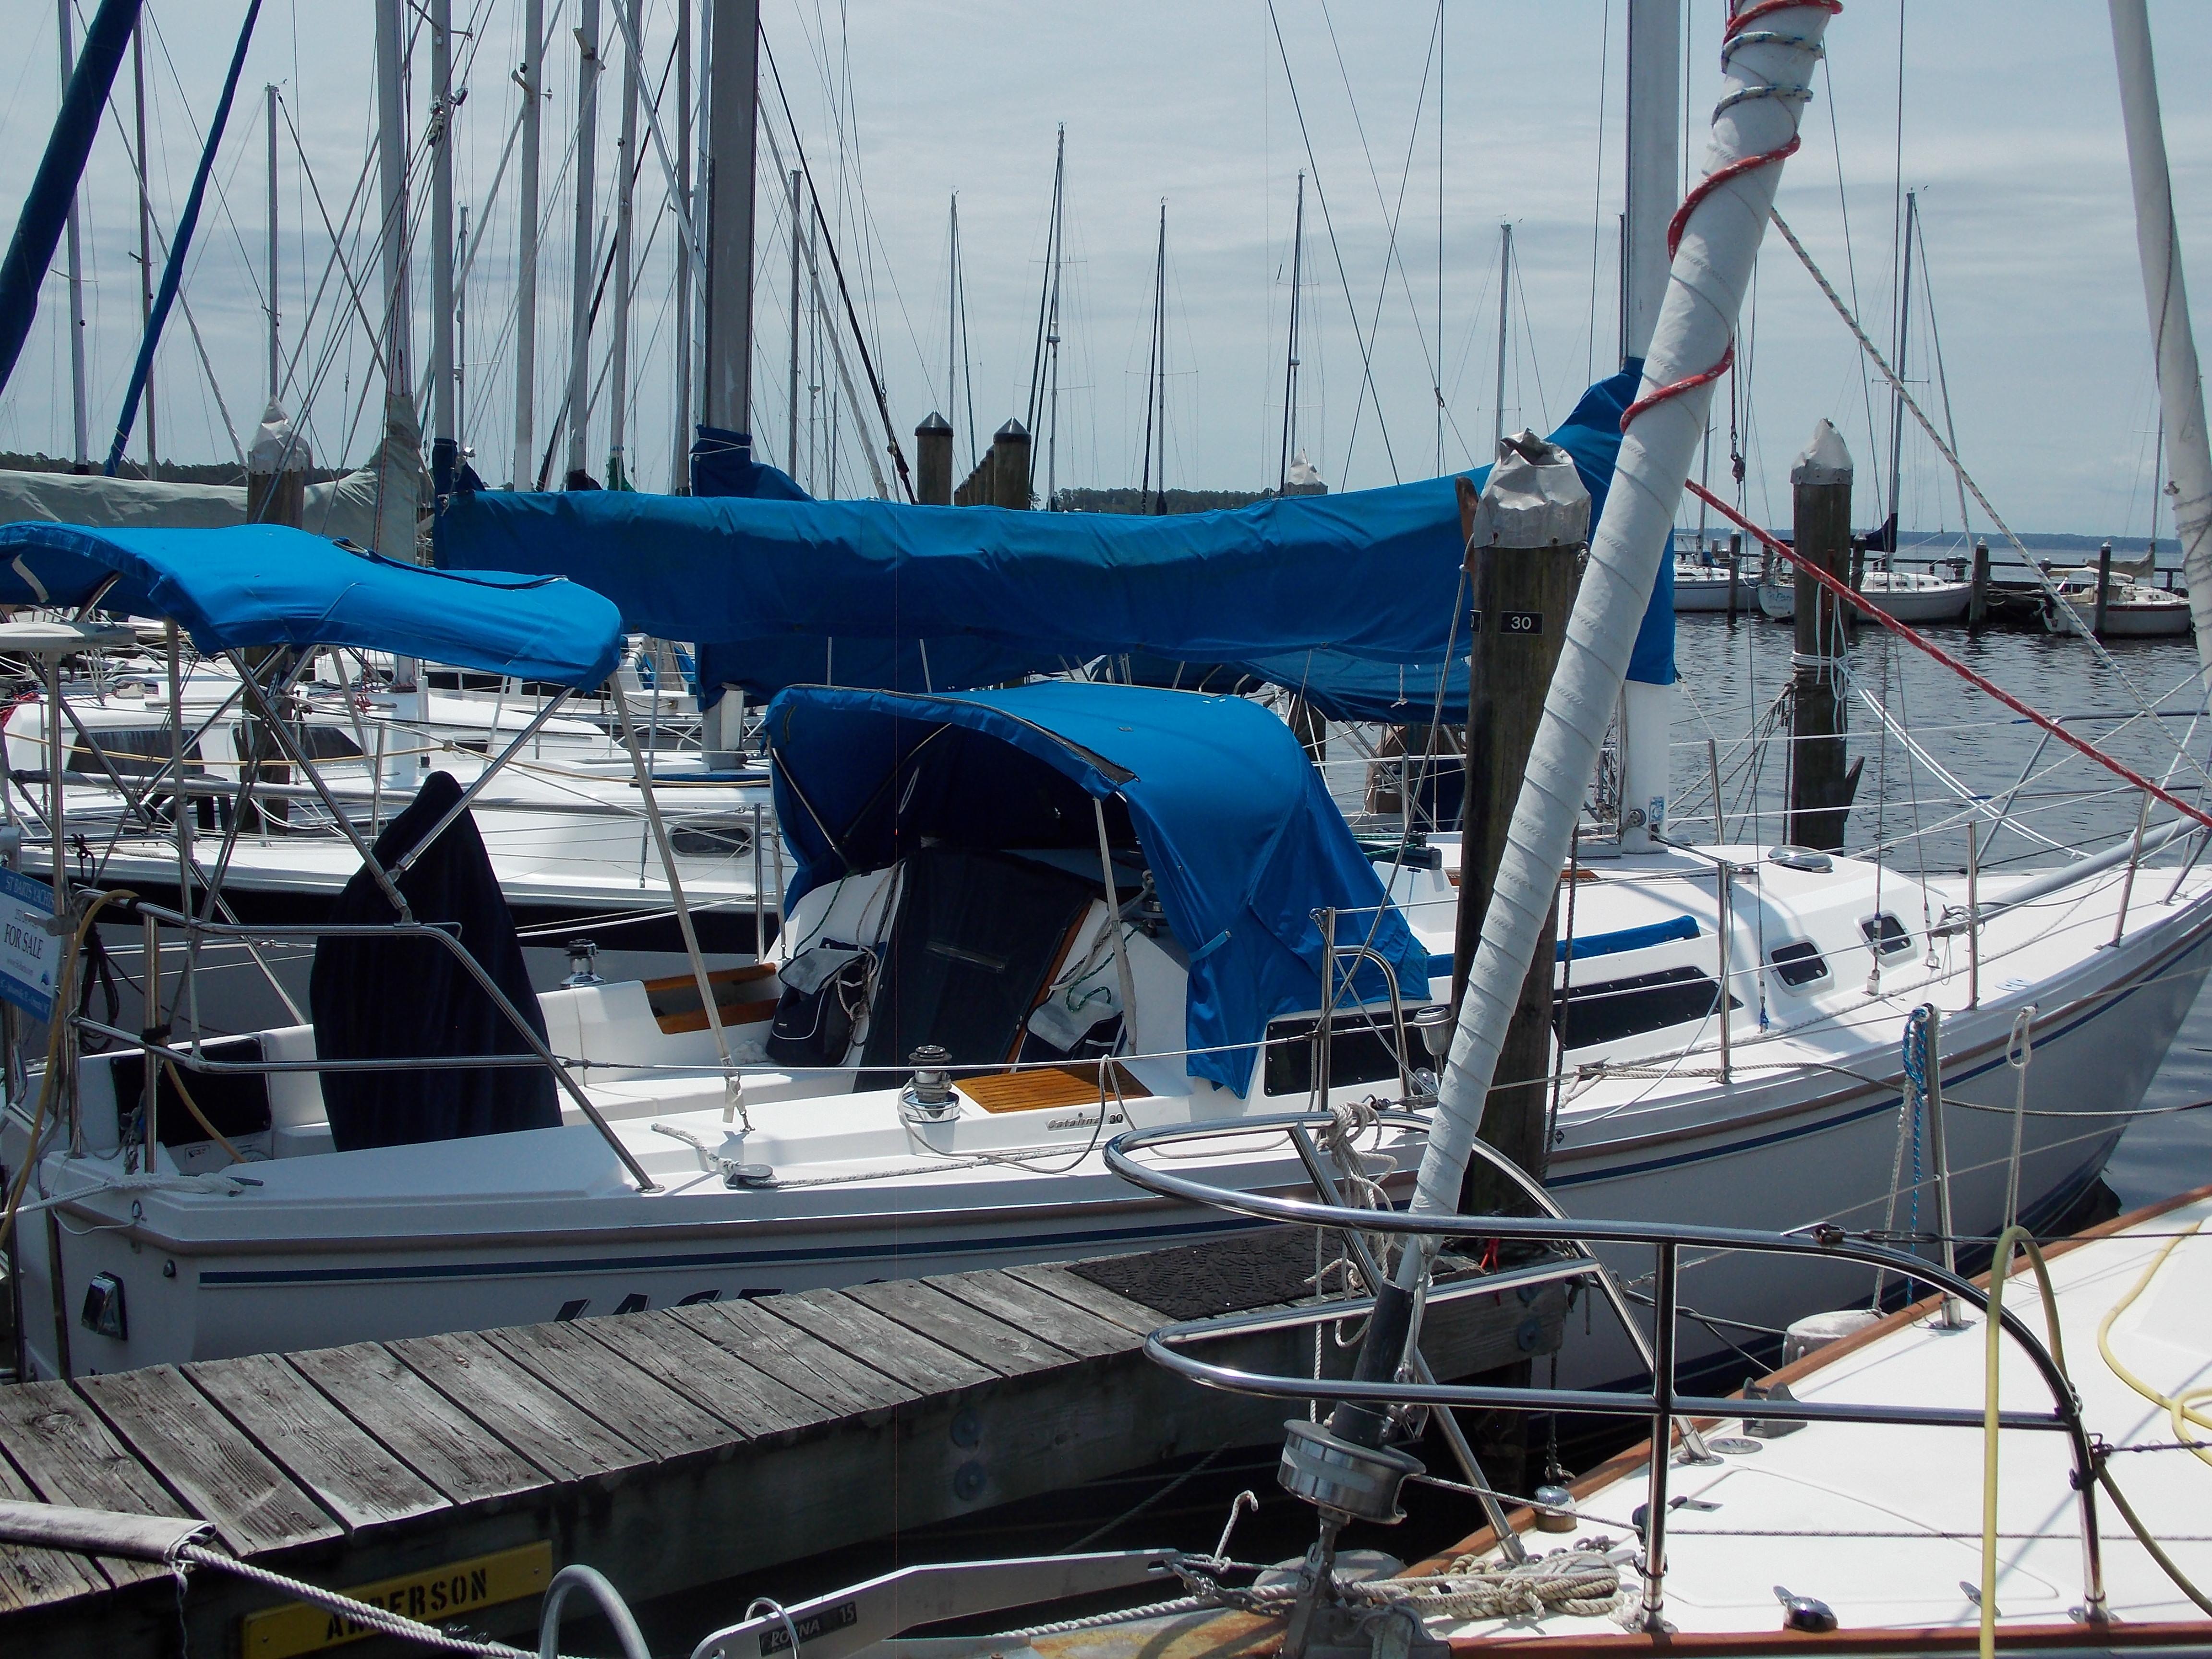 1990, Catalina 30 MkII For Sale, St  Barts Yachts